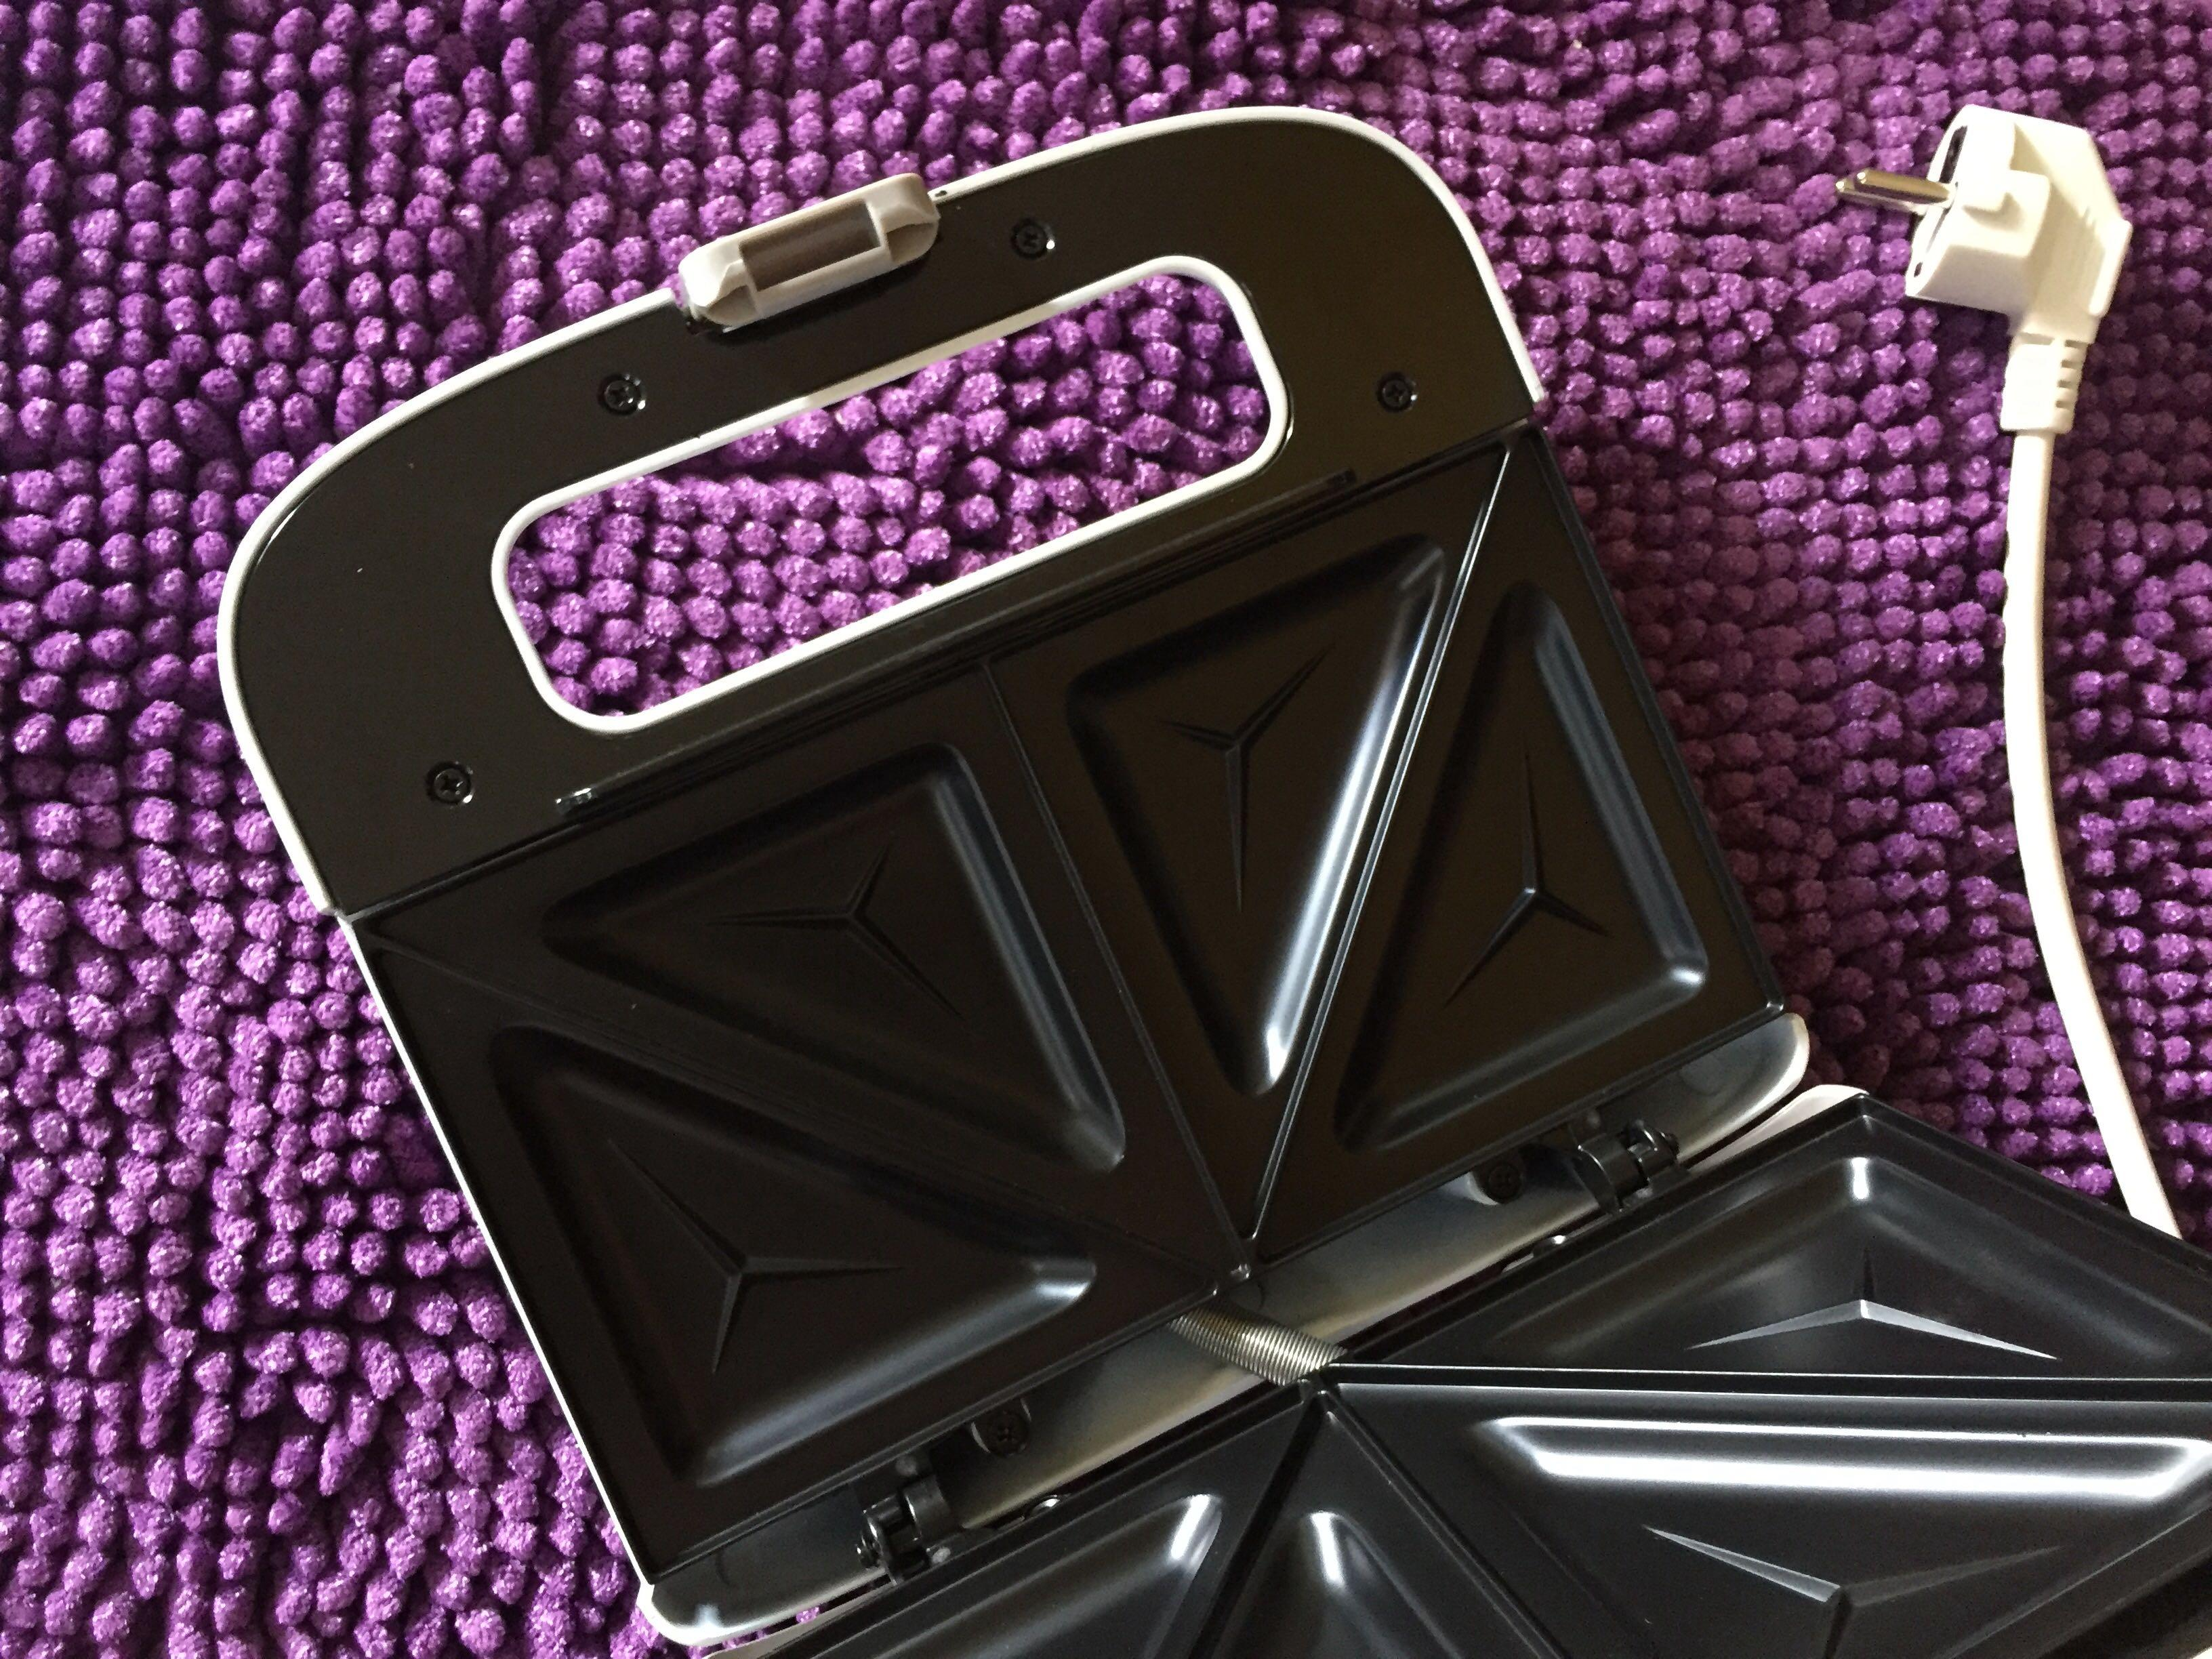 Philips Toaster HD2393 - Putih